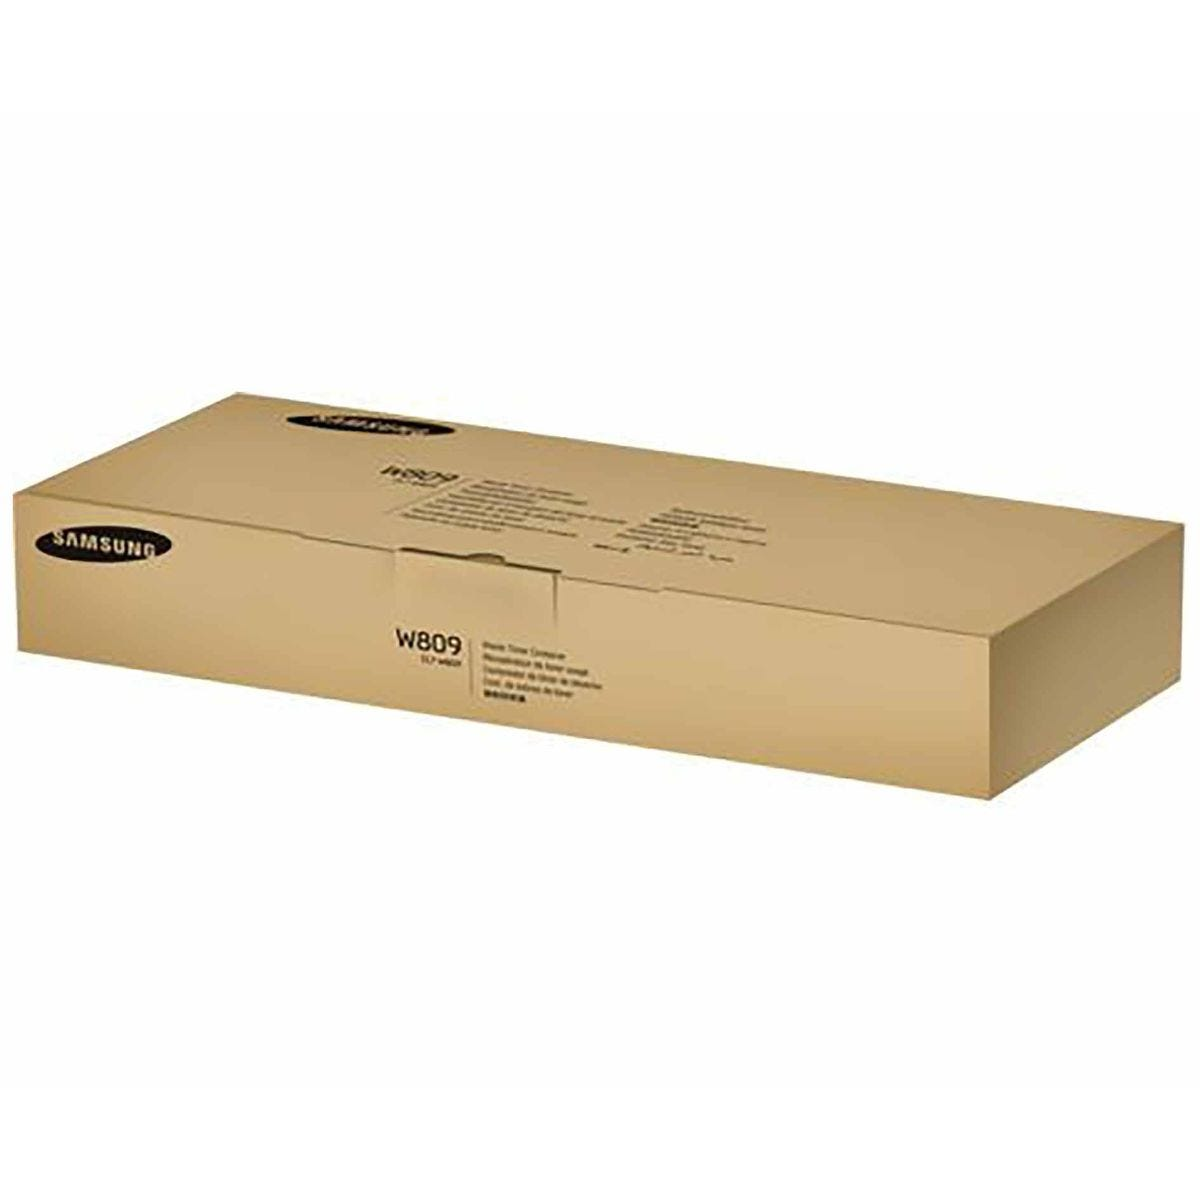 Samsung CLX9201NA Waste Toner